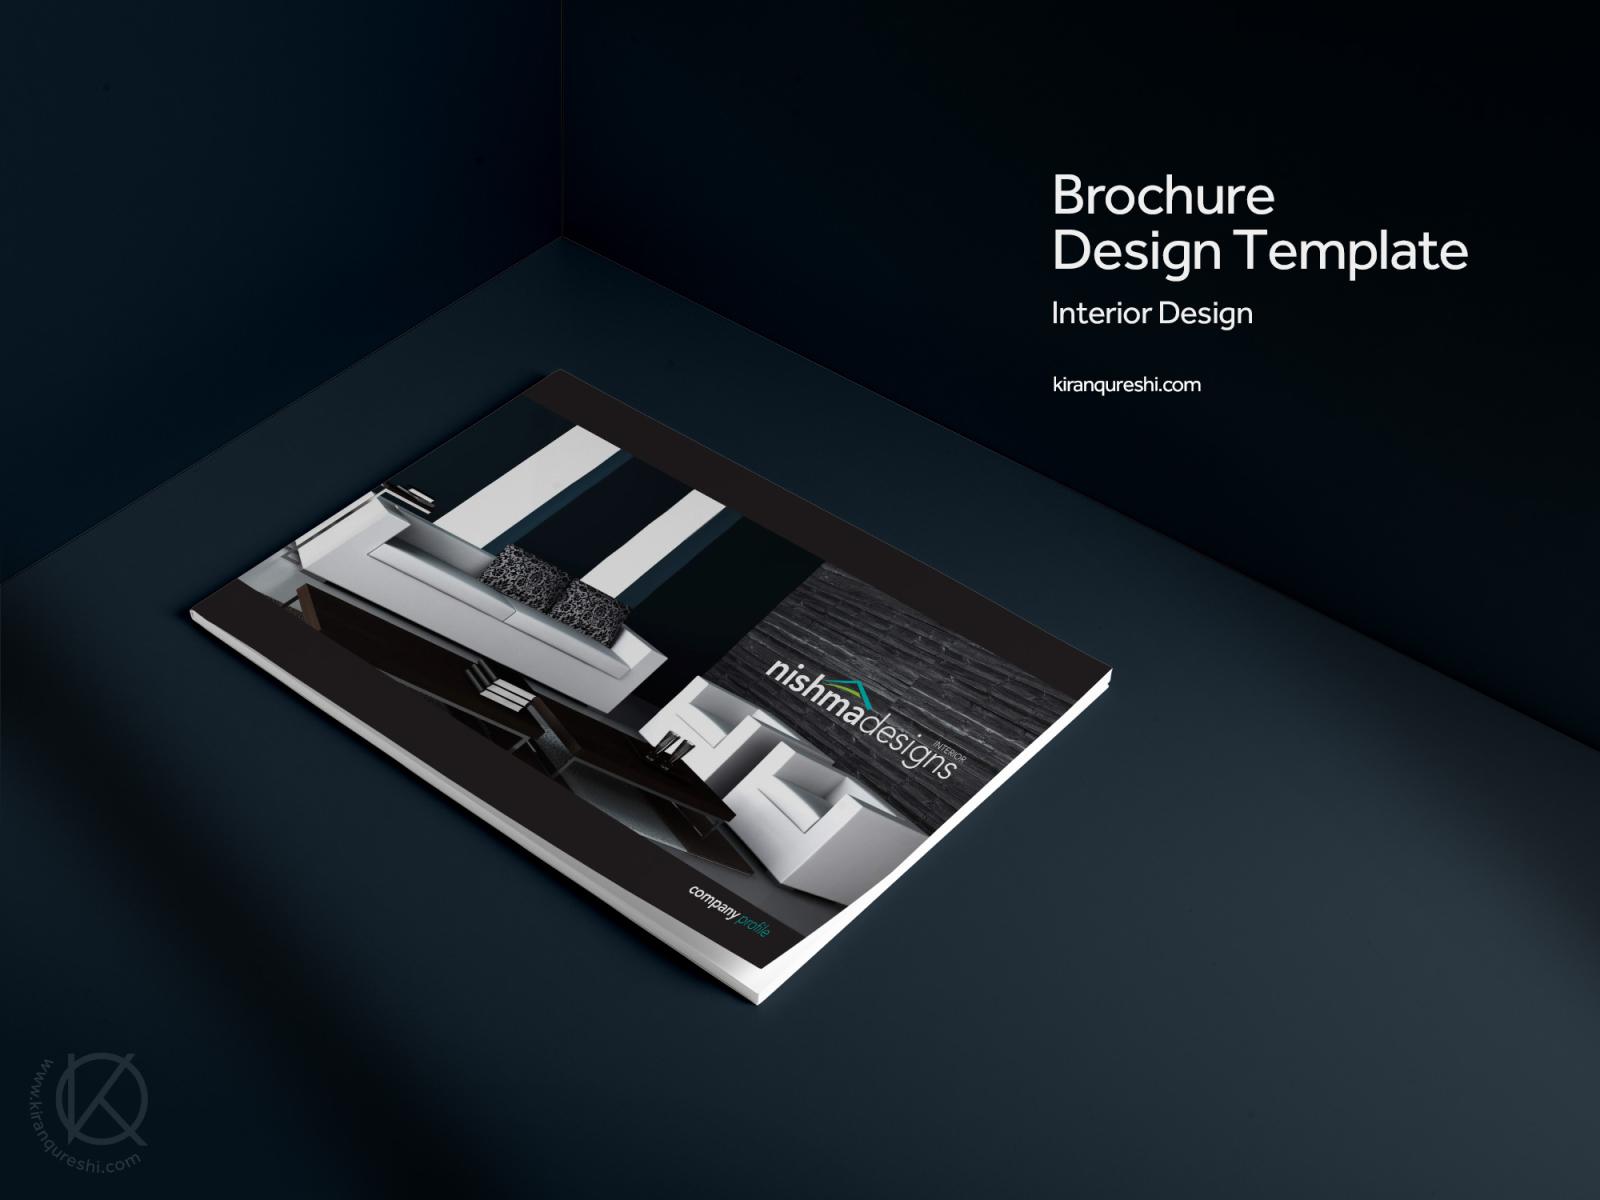 Company Profile Brochure Interior Design By Kiran Qureshi On Dribbble